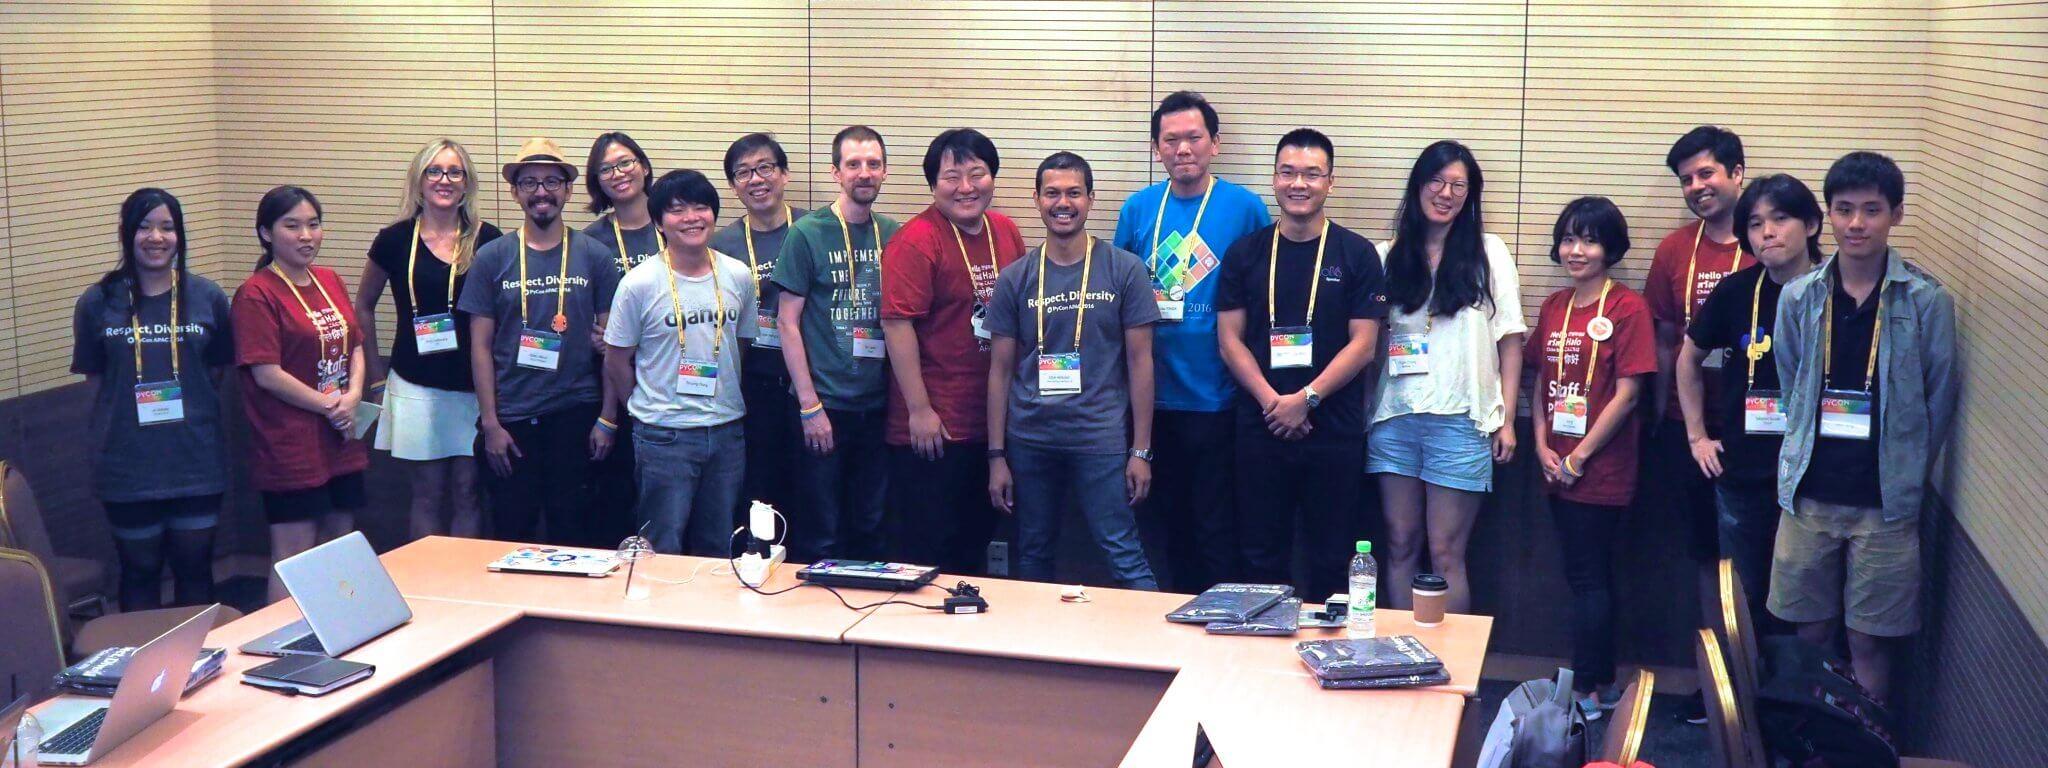 PyCon APAC meeting in Seoul 2016